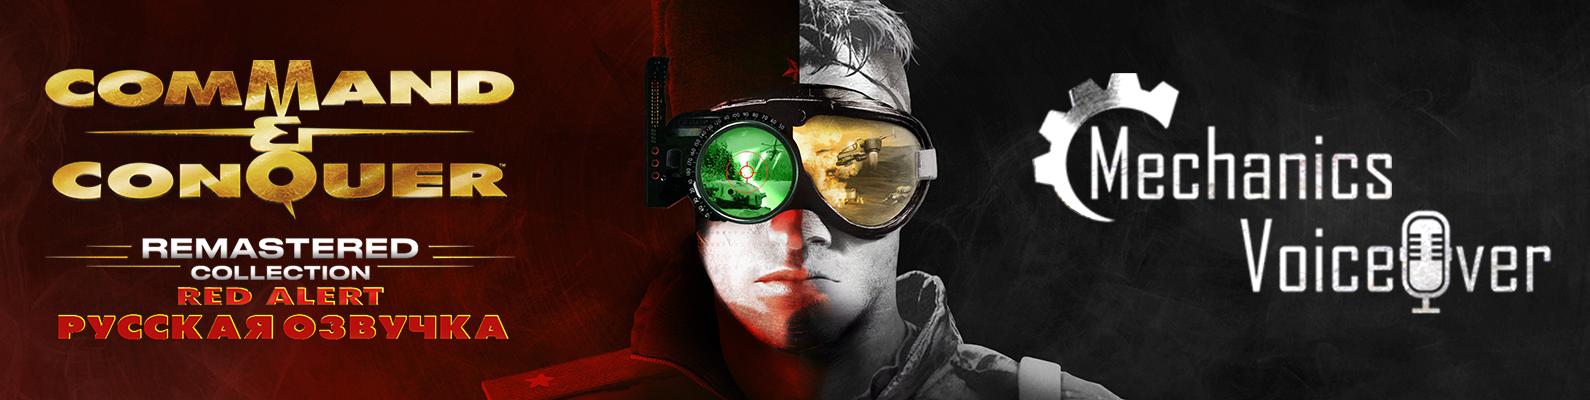 Command & Conquer Red Alert - Remastered: Демонстрация геймплея с русской озвучкой (от R.G. MVO)